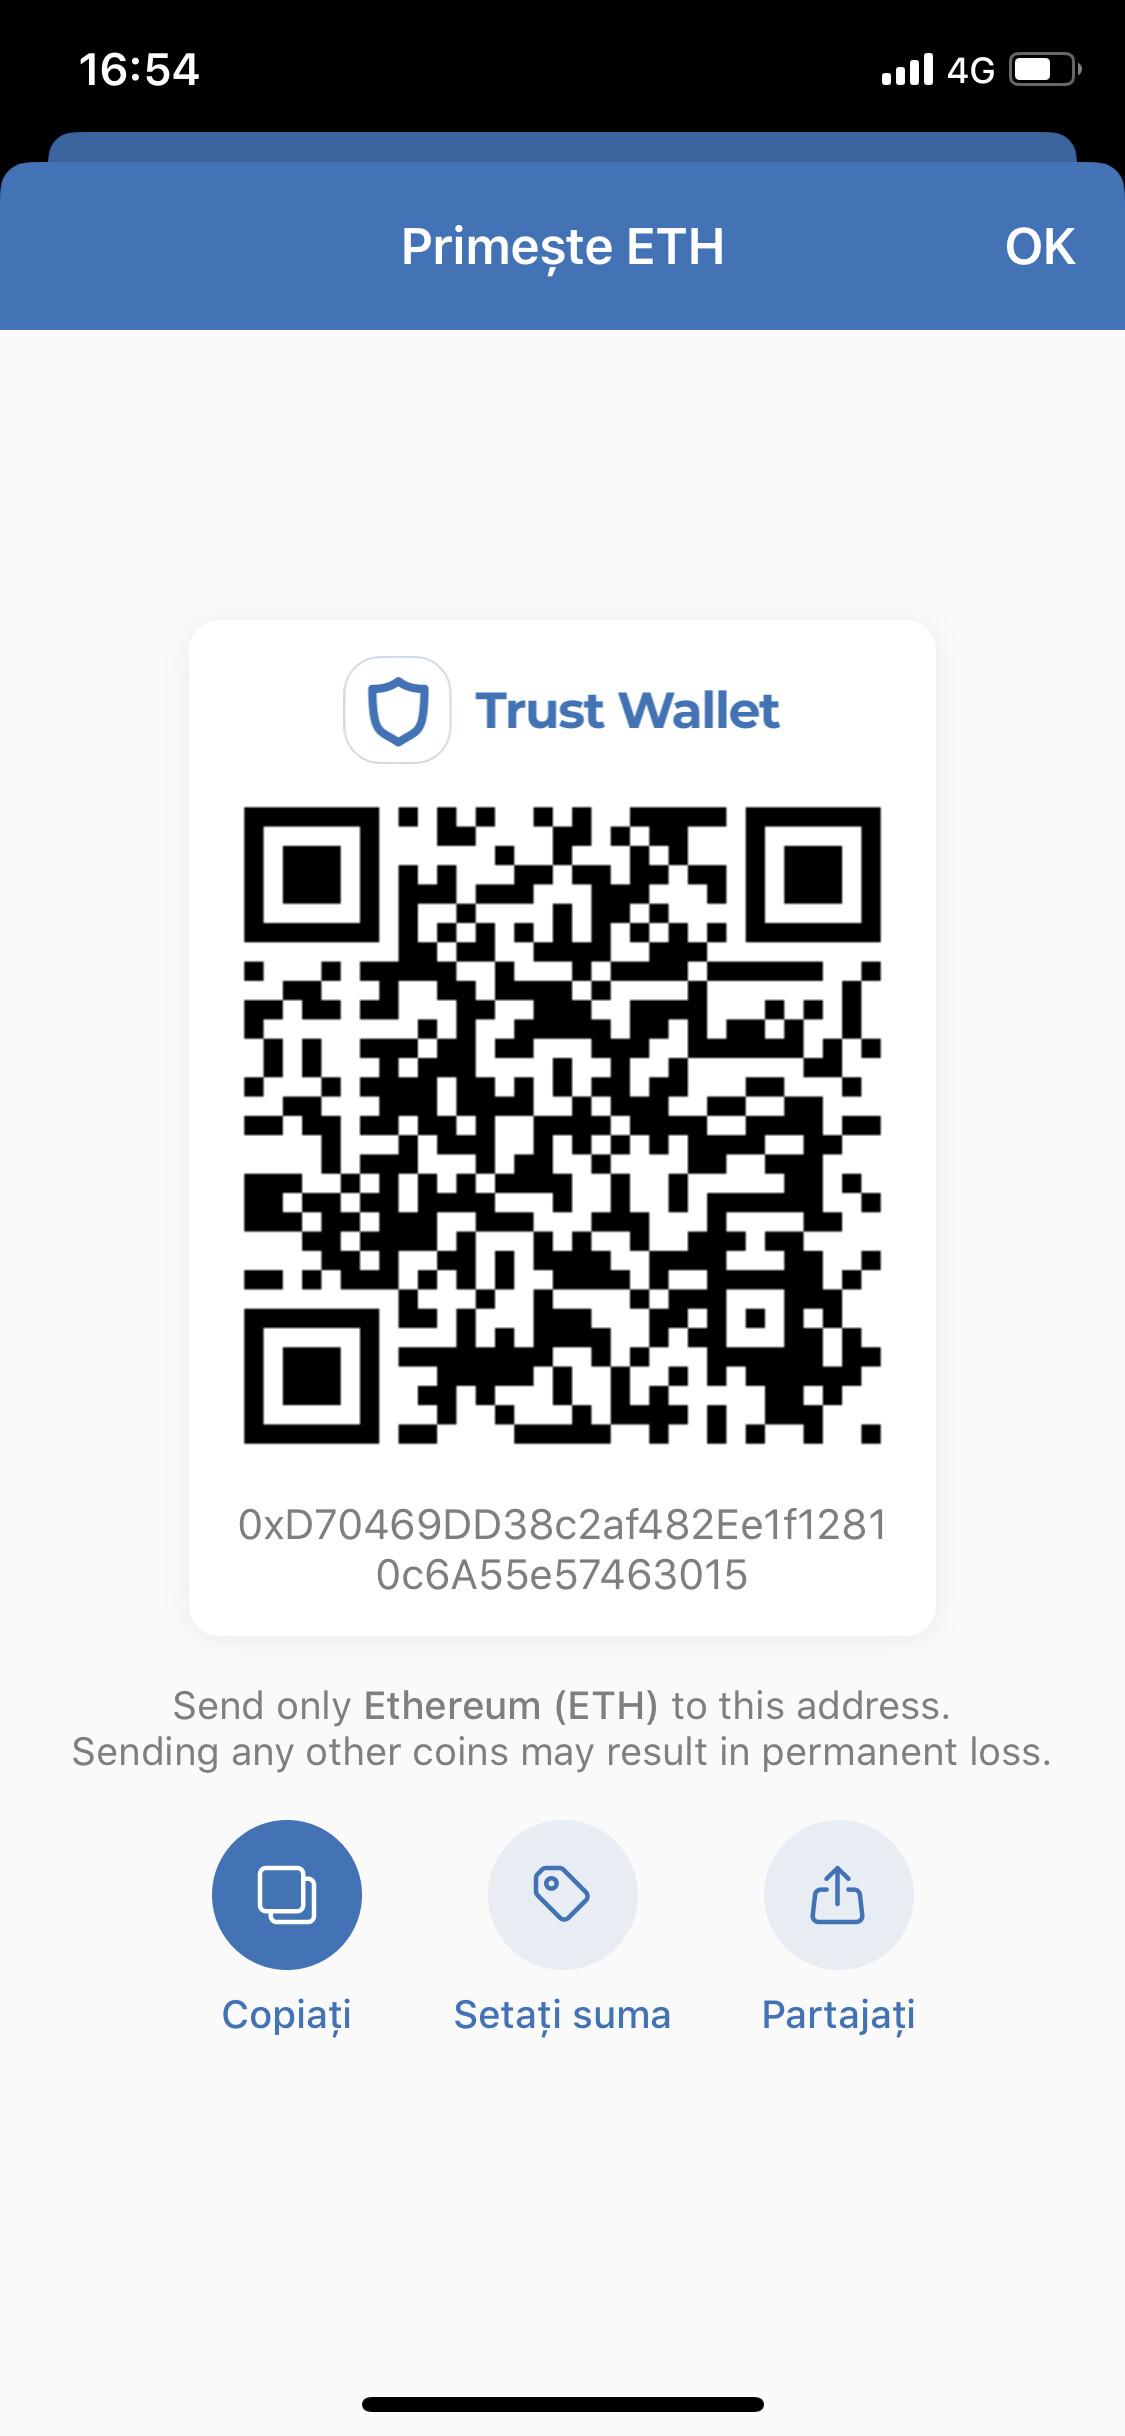 Transferred Binance Peg Ethereum Bep20 To Ethereum Eth Address English Trust Wallet